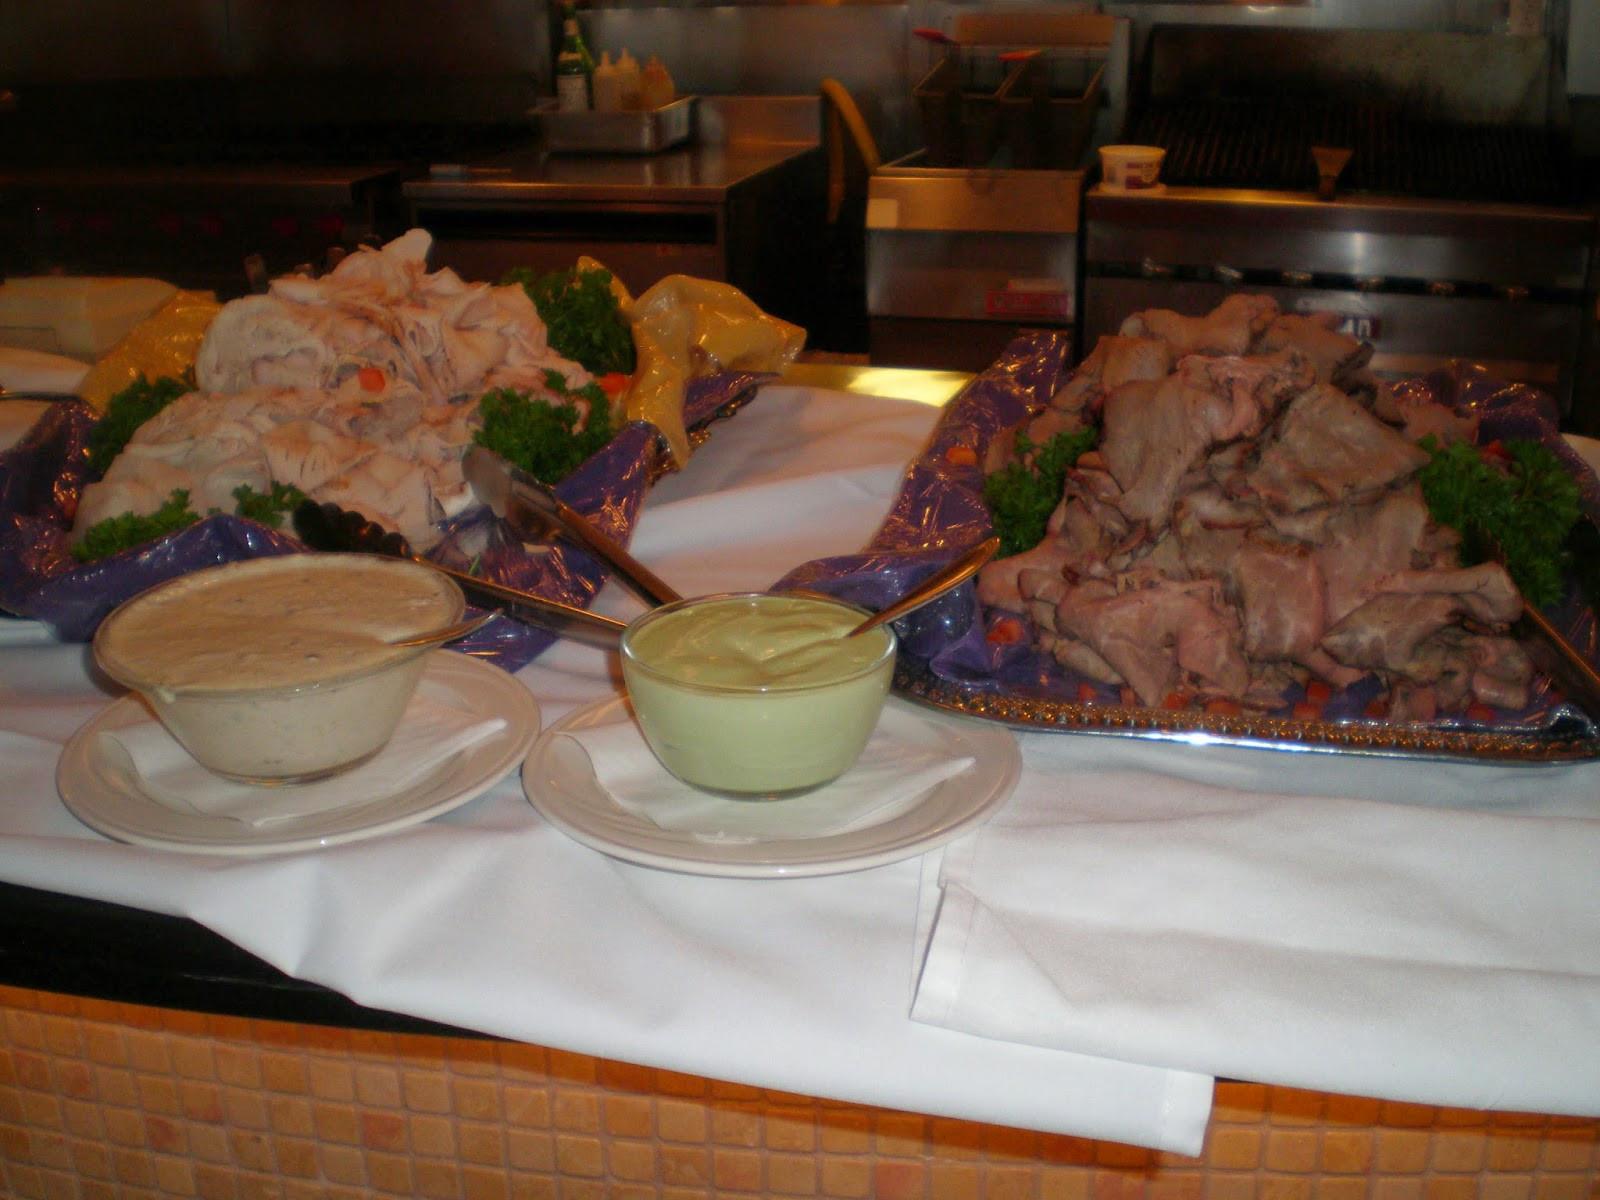 Easter Dinner Restaurants  Restaurant Success Tips Easter Brunch Dinner Menu Ideas